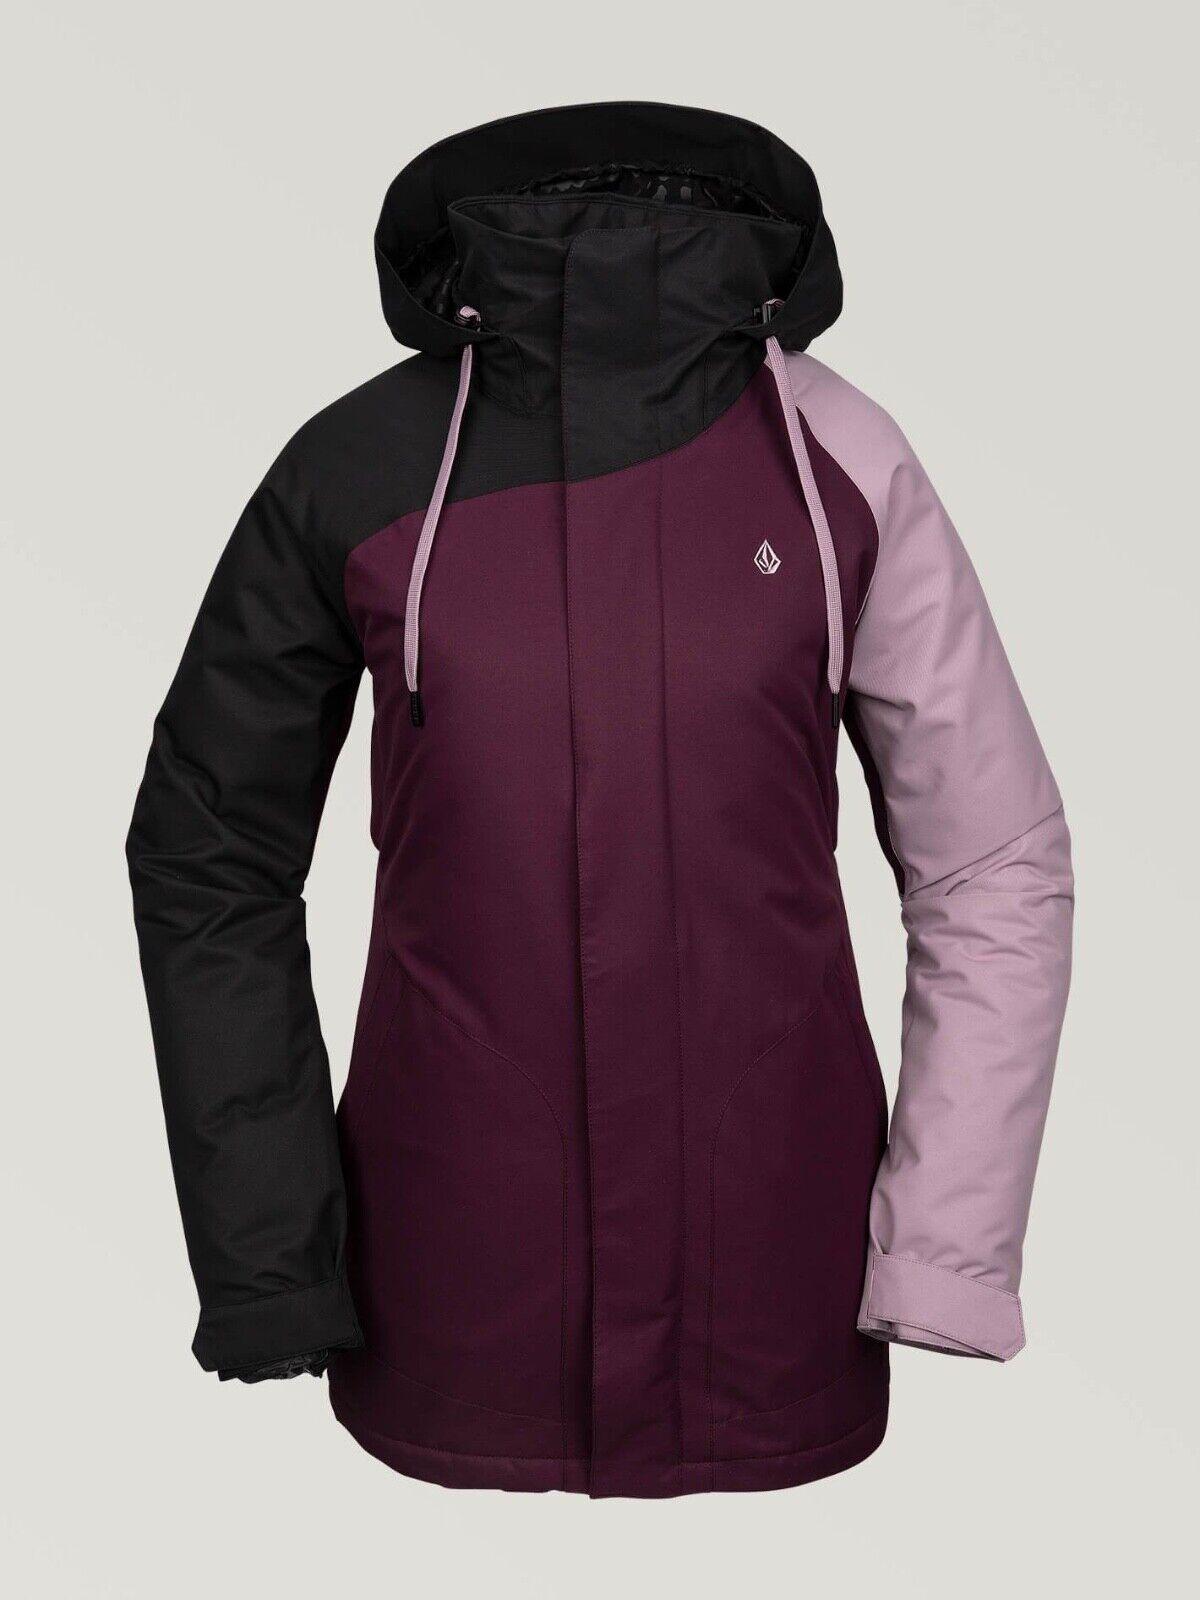 Brand New damen 2020 Volcom Westland Insulated Snow Jacket Merlot